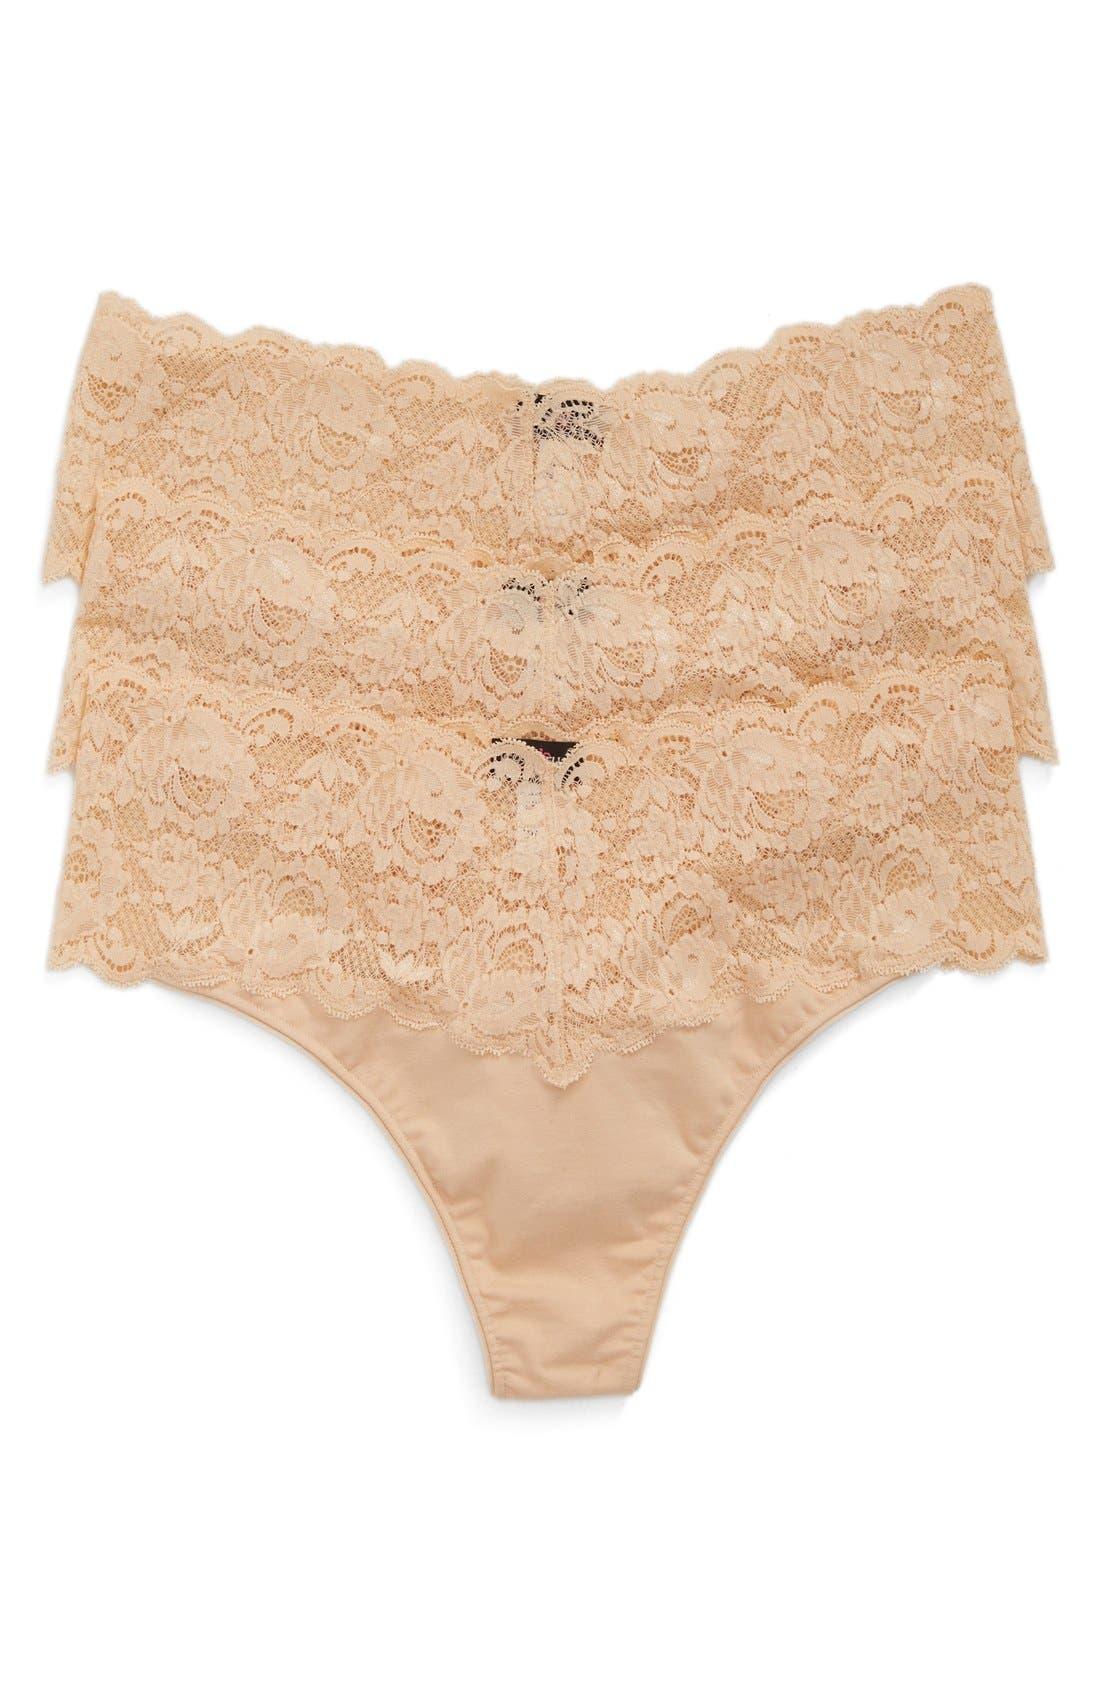 'Lovelie' Lace Trim Thong,                         Main,                         color, Blush/ Blush/ Blush